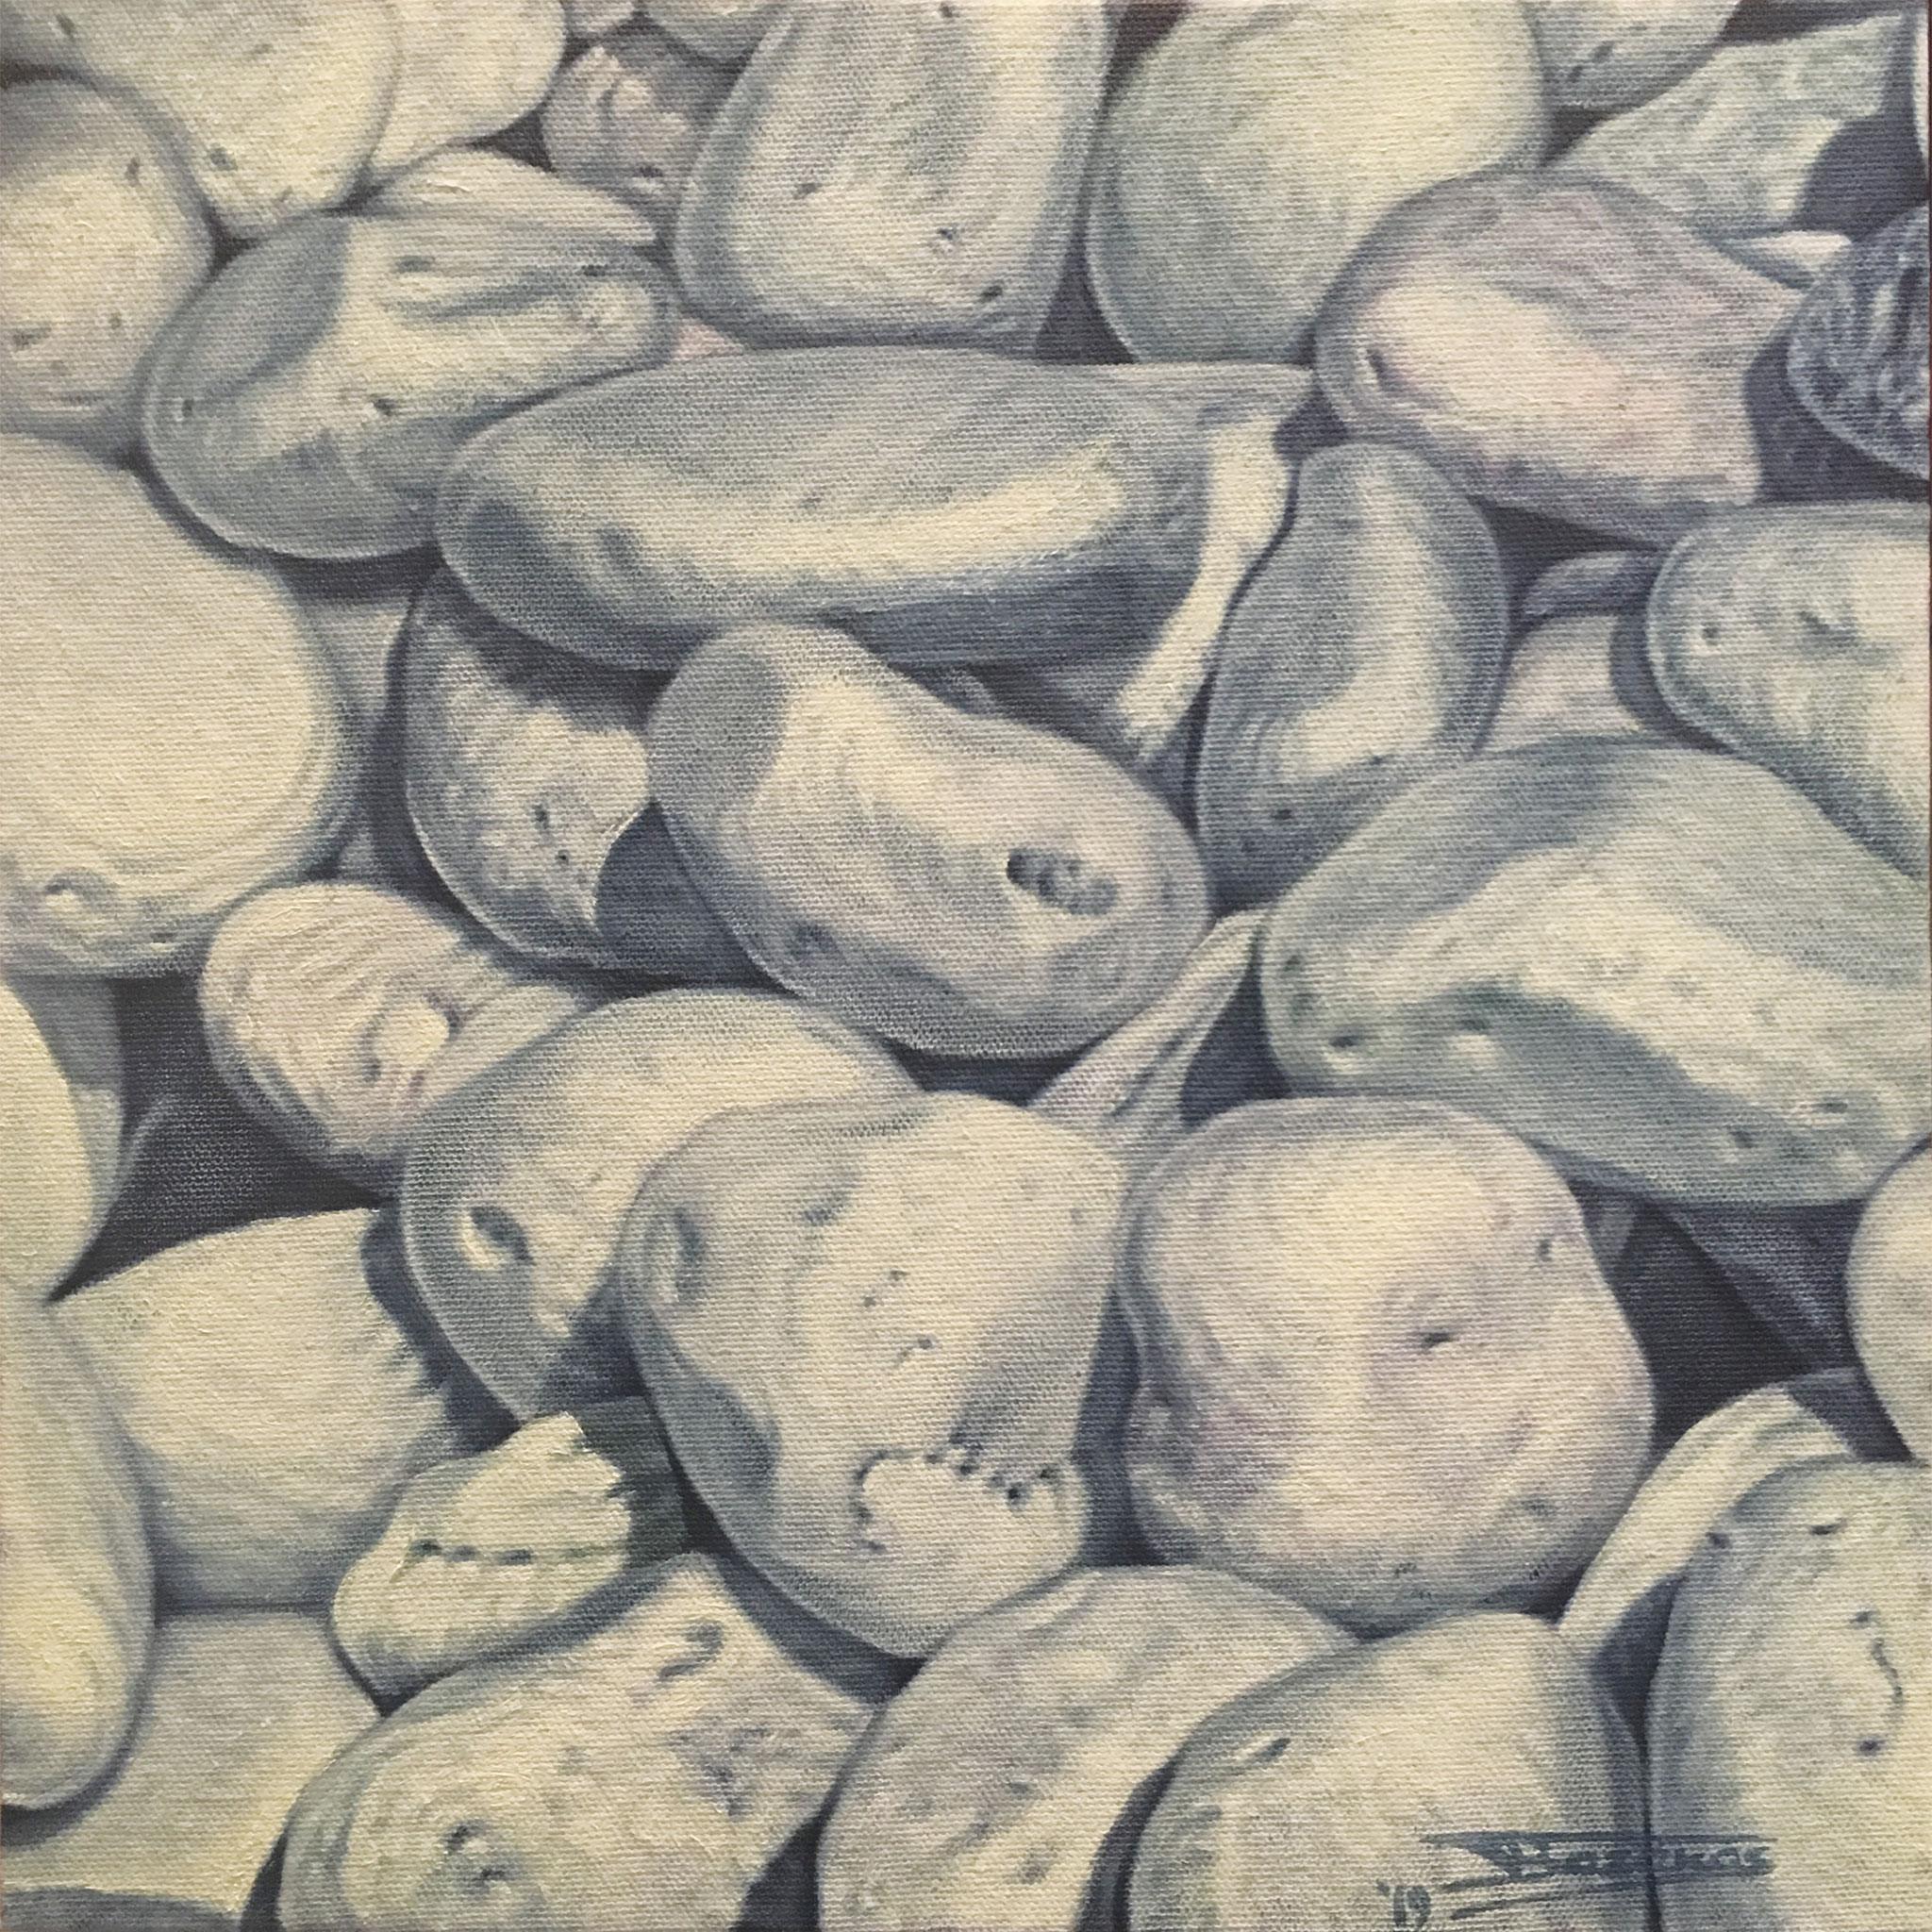 """Votsala#1""  (30x30)cm, Oil on linen canvas (2019) - Private collection"